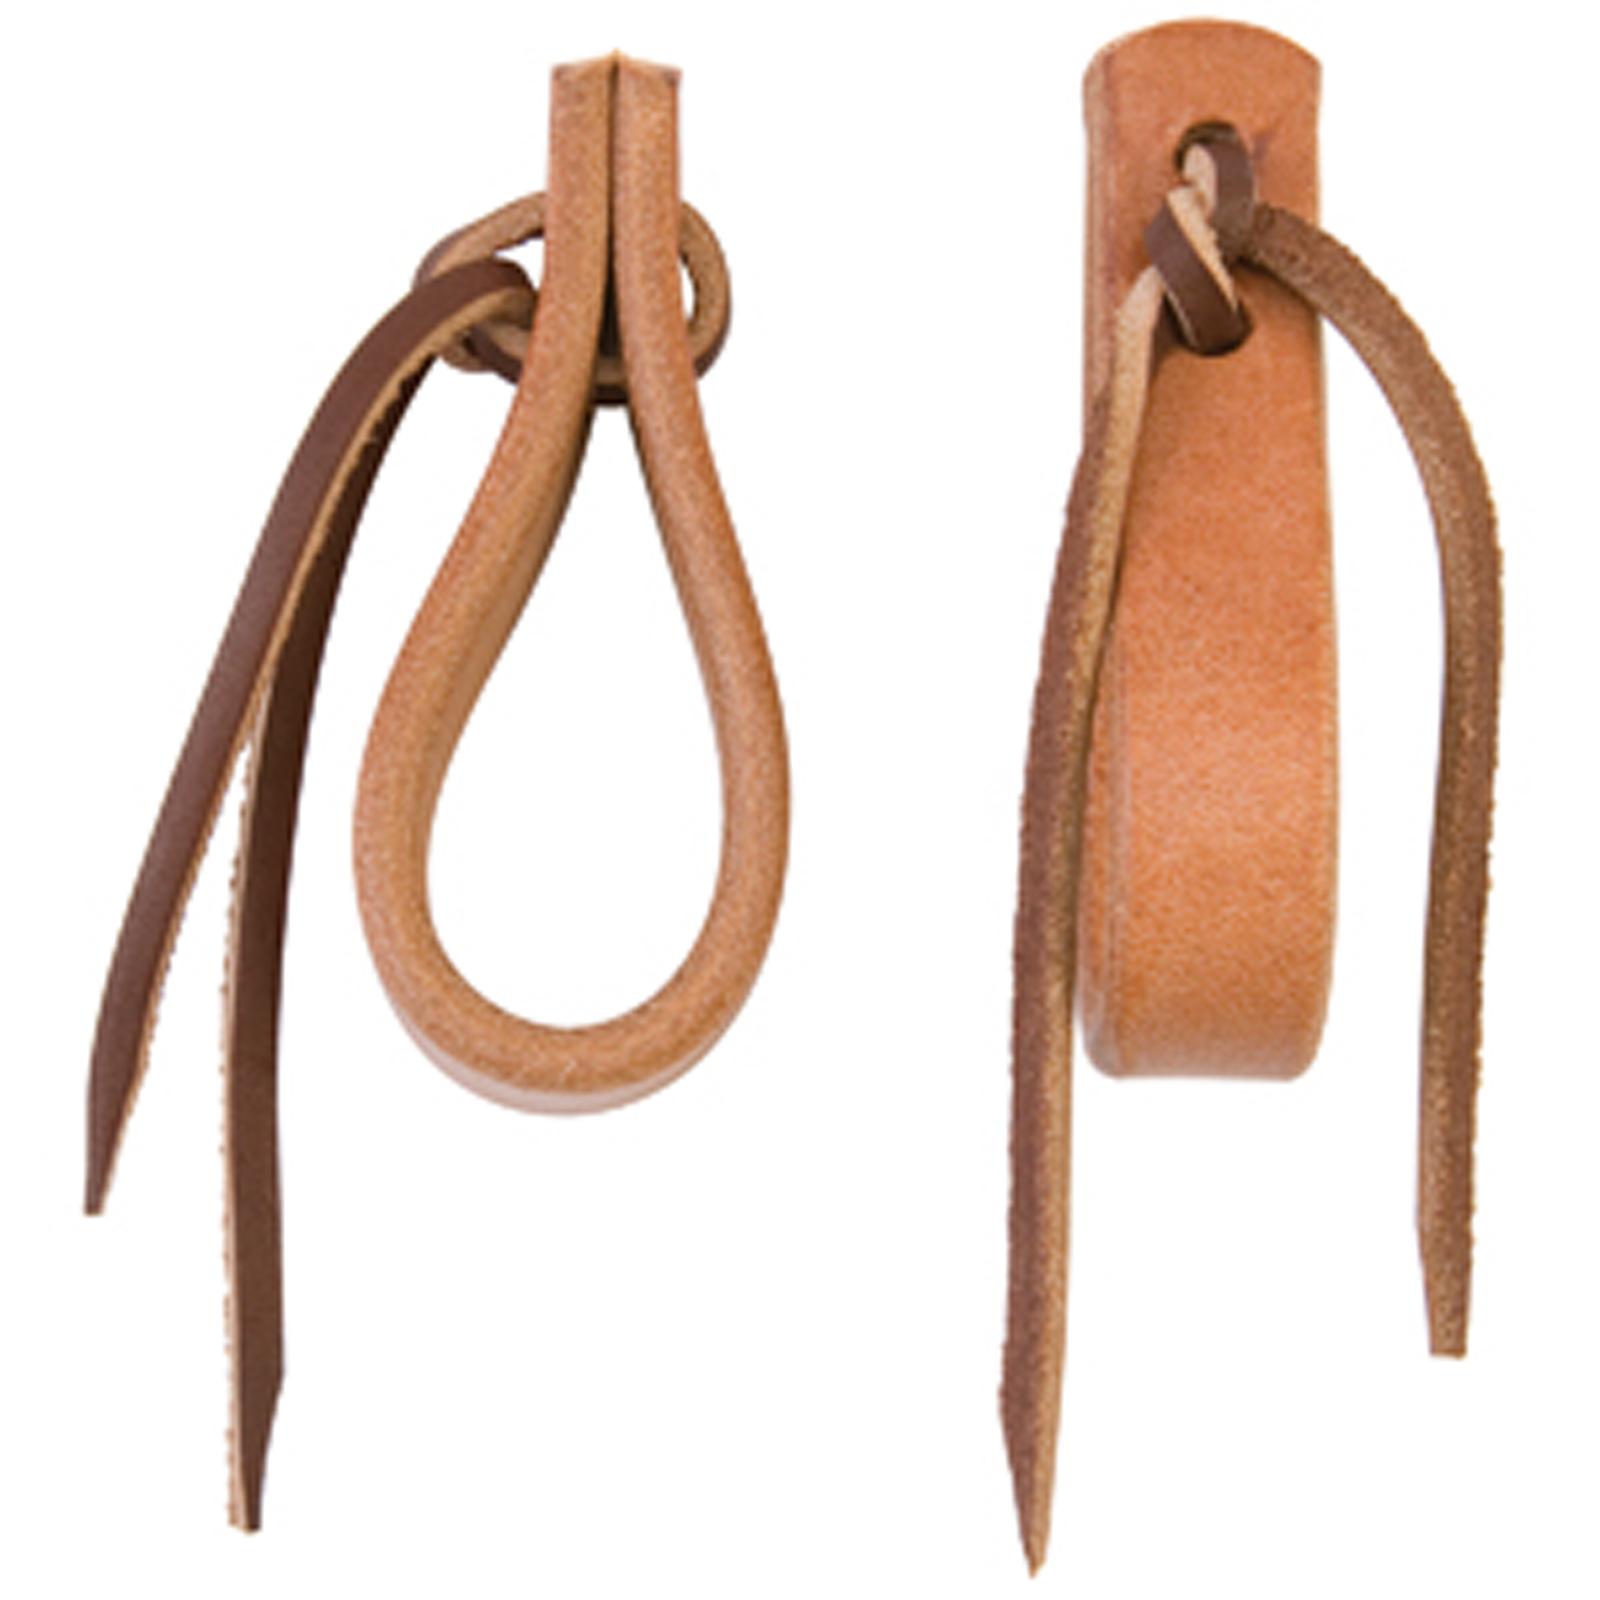 Weaver Water Tie Ends with Brown Latigo Ties